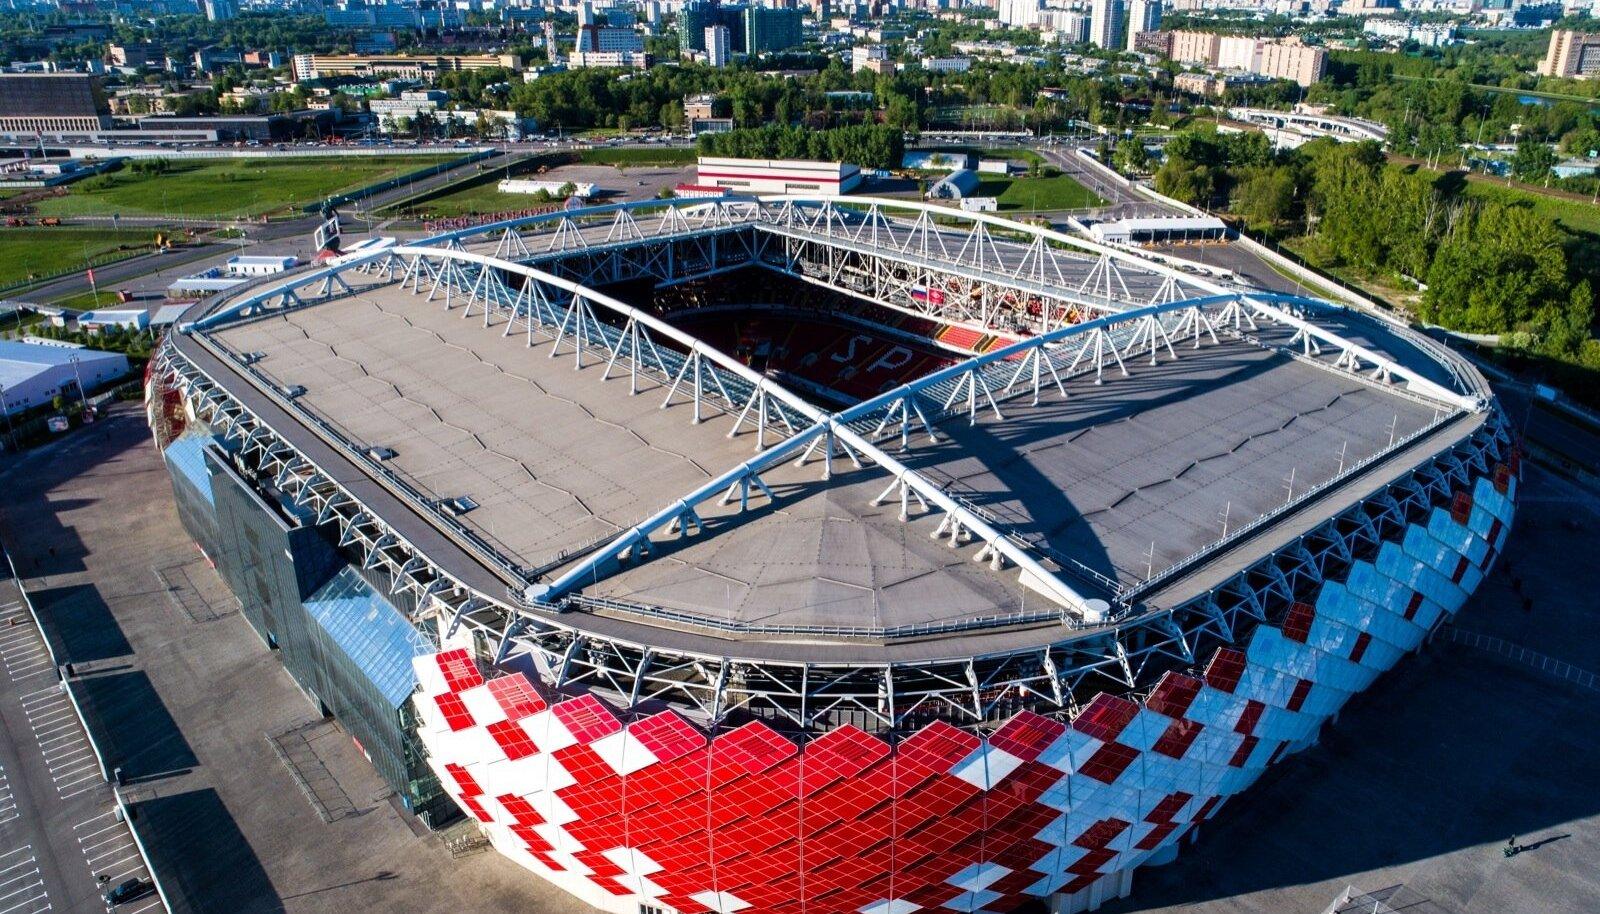 2018 FIFA World Cup venues: Spartak Stadium